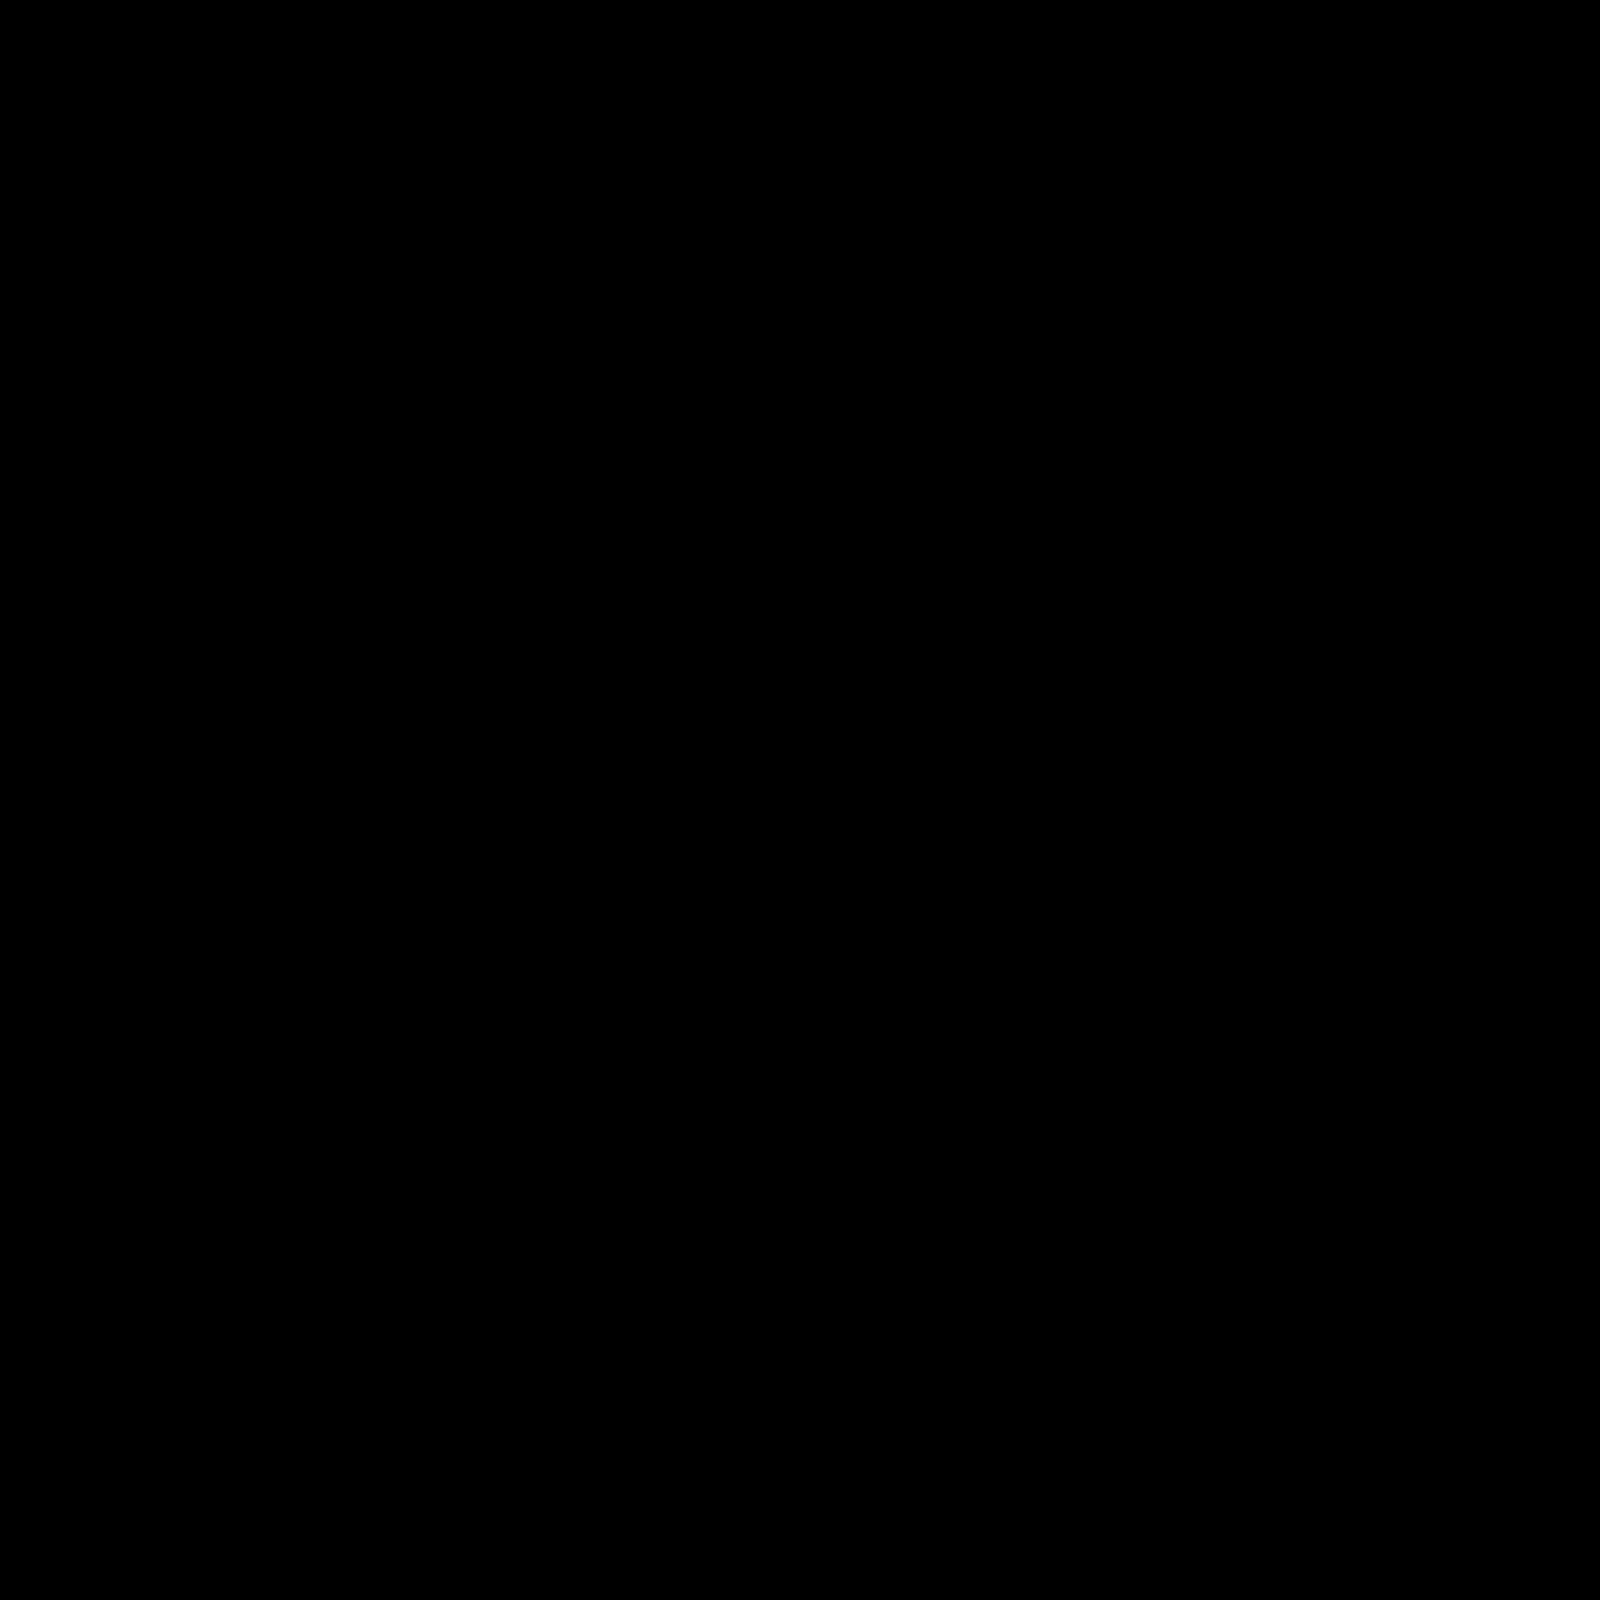 Носки icon